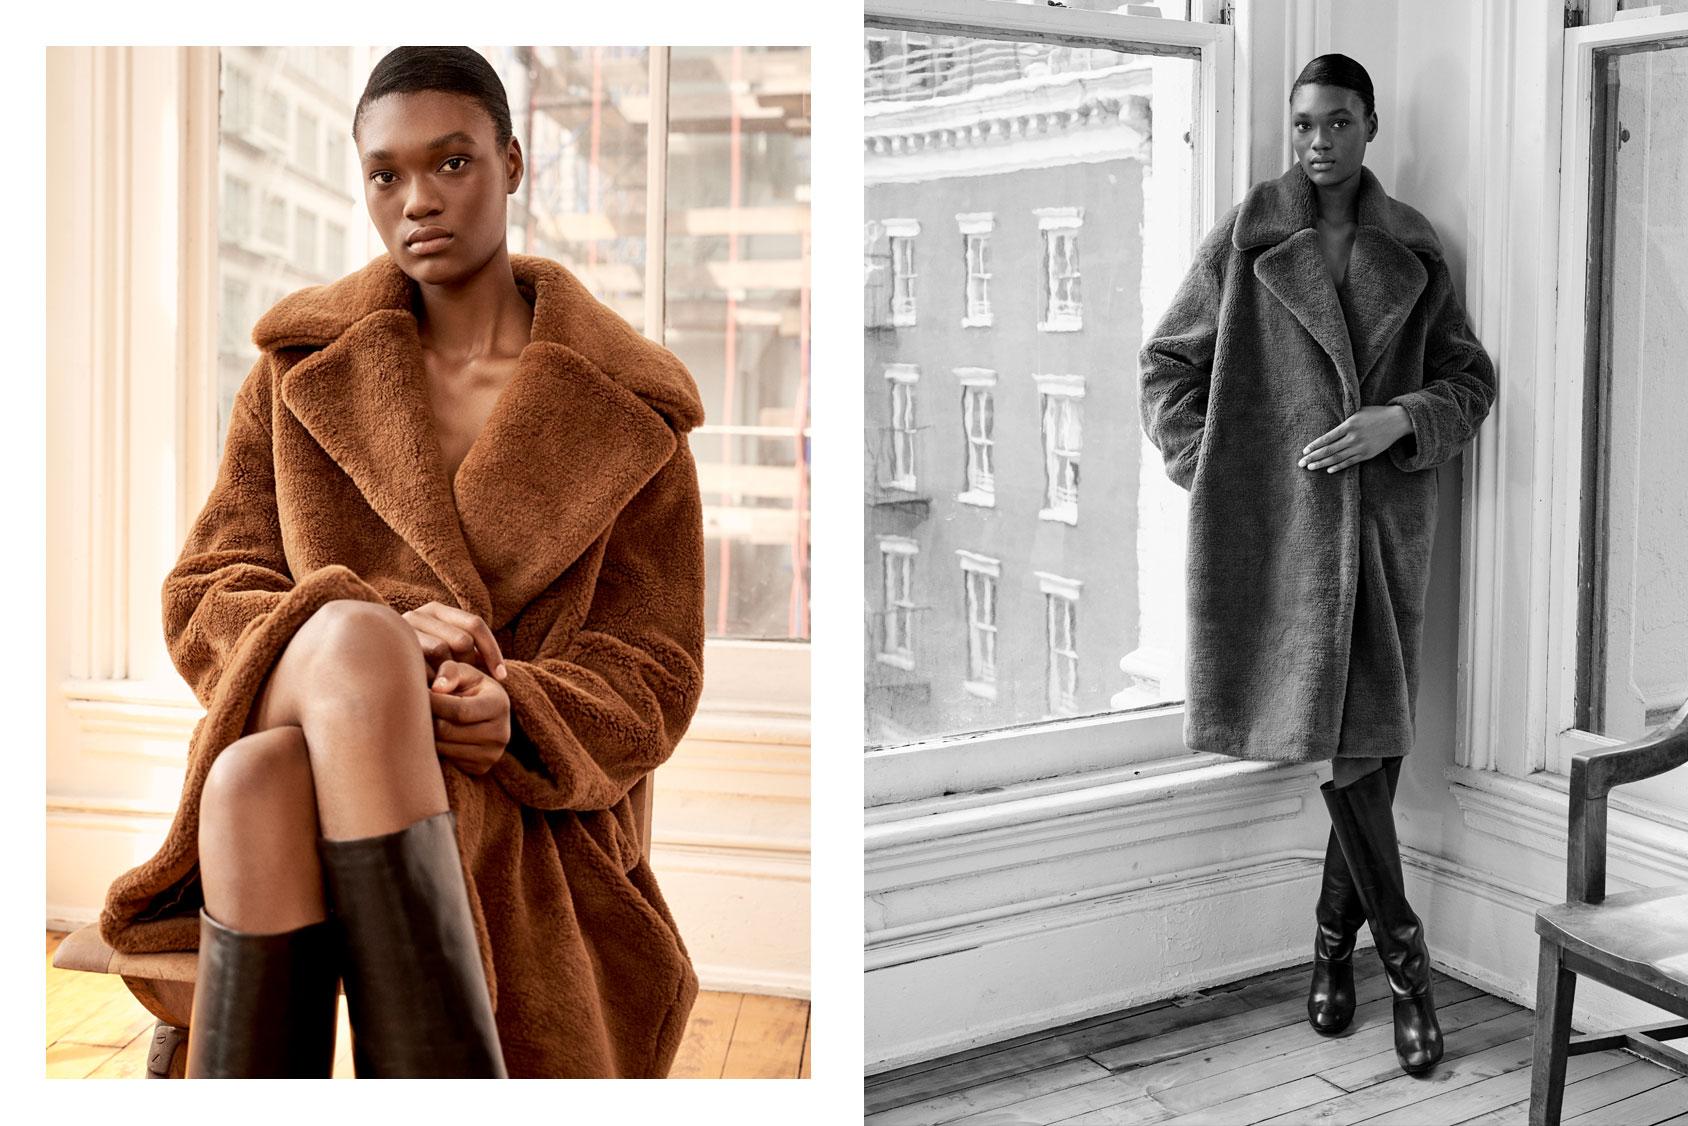 Manteau de fourrure Premium Essential de H&M